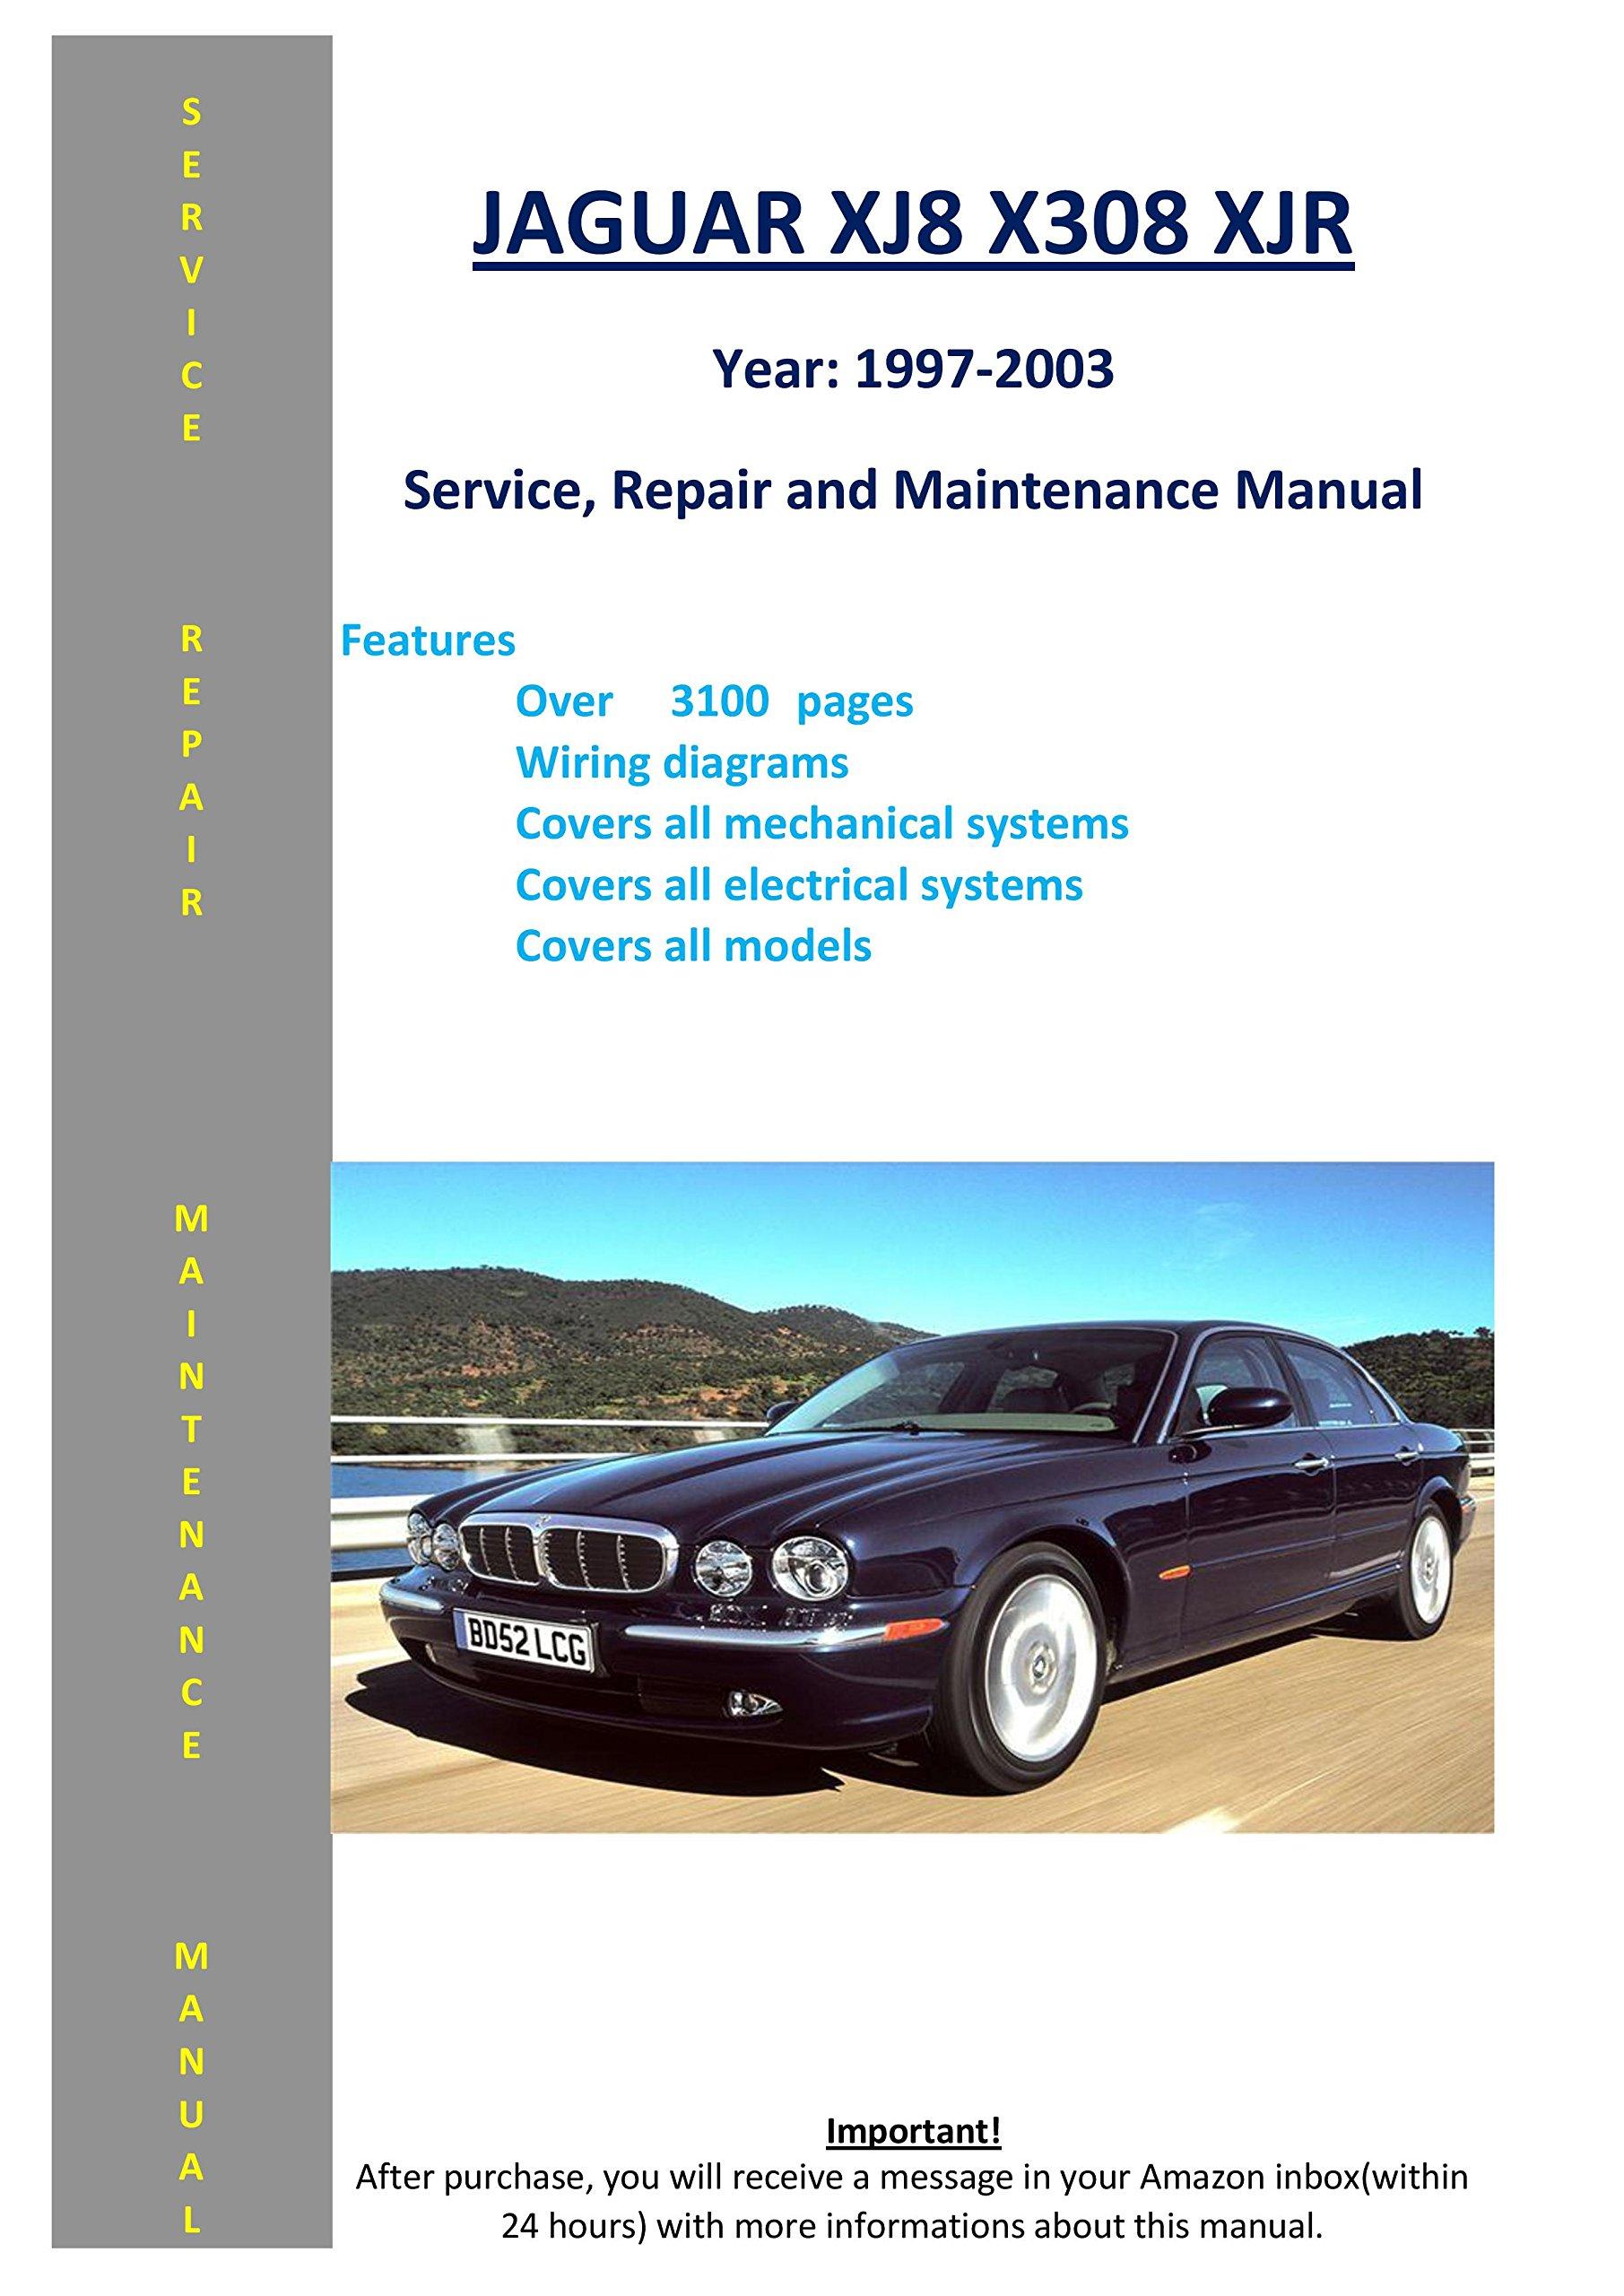 Jaguar Xj8 Xjr X308 From 1997-2003 Service Repair ... on jaguar xj40, jaguar xj series, jaguar vip style, jaguar supercharged logo, jaguar twin turbo, jaguar x300, jaguar xj sport 2002, jaguar x305, jaguar xtype, jaguar xjs,